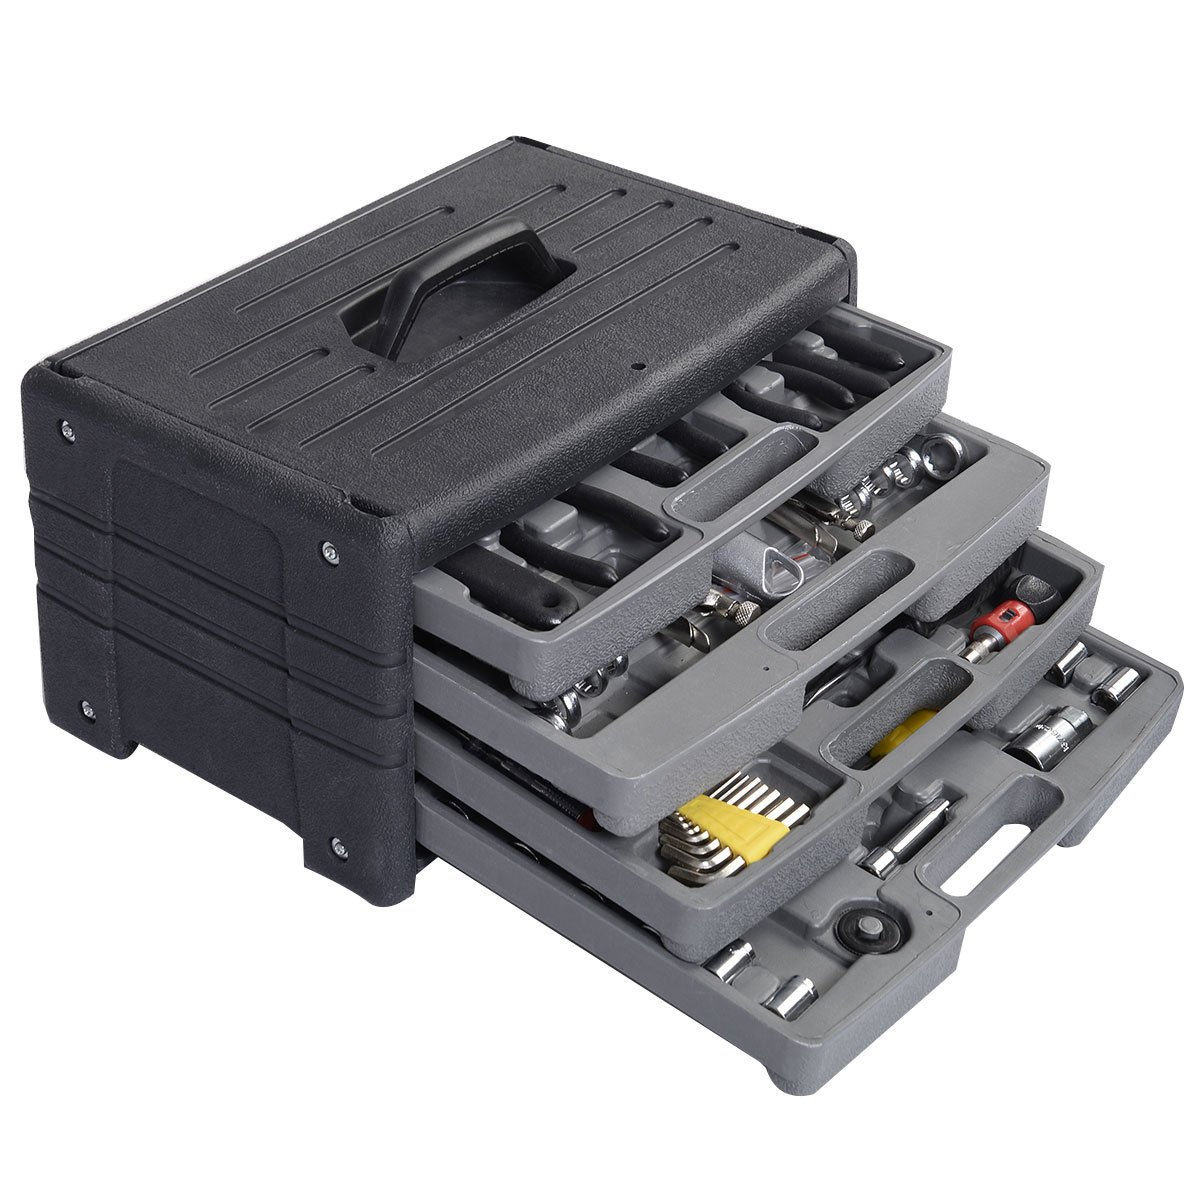 New 99 PCS Garage Tool Mechanic's Tool Kit Set Shop Vehicle Repair four floors by Nature republic